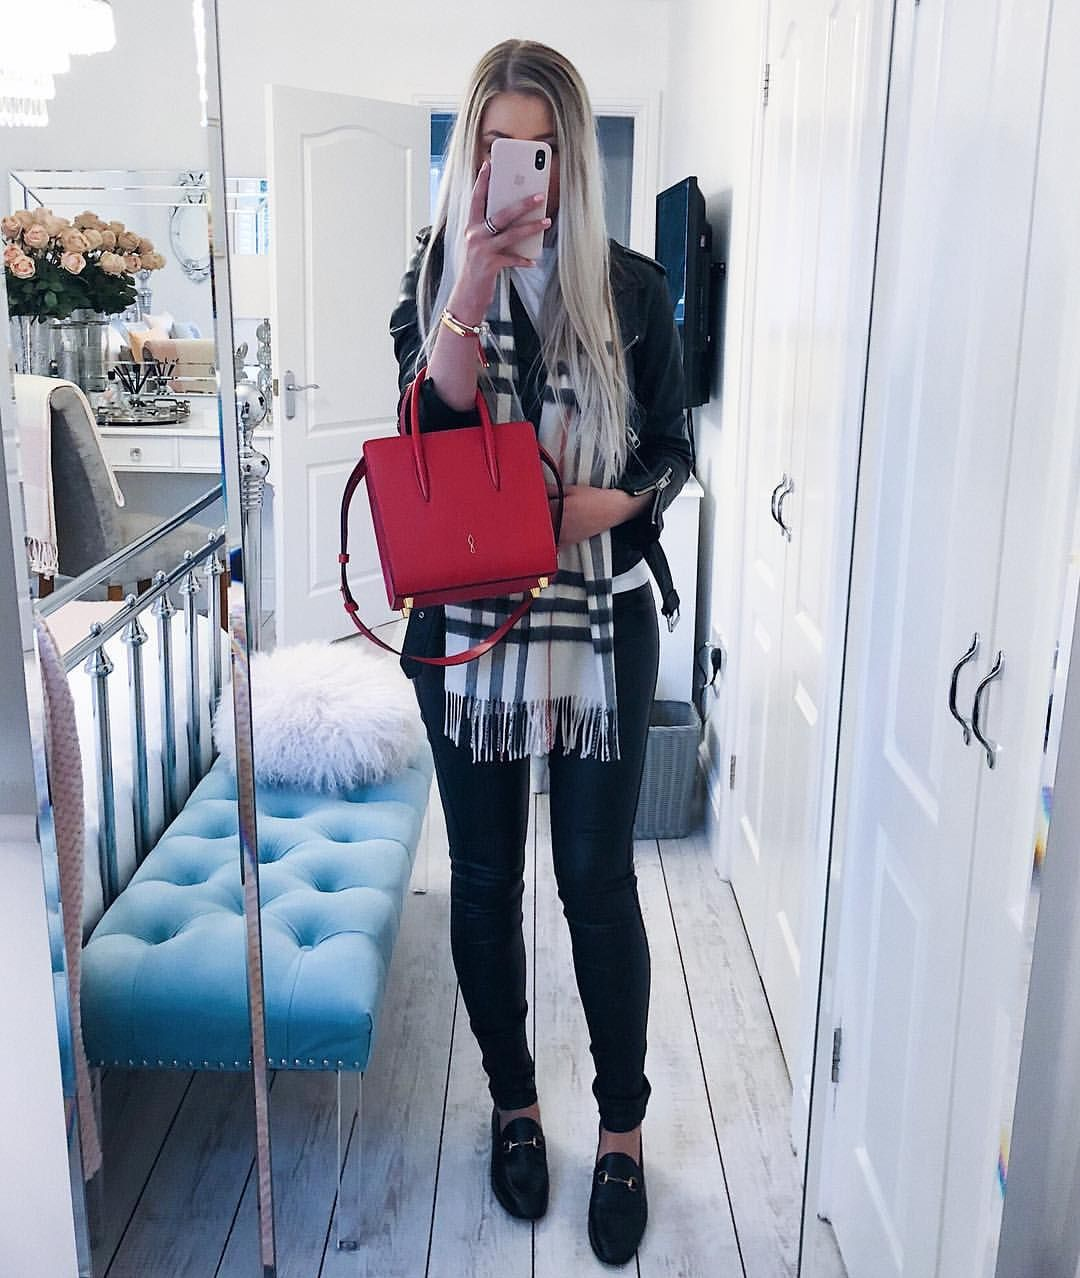 6e123b441 Instagram: @emilyjanehardy - Black allsaints biker jacket, Burberry scarf,  red Christian Louboutin paloma bag, black Gucci Jordaan loafers